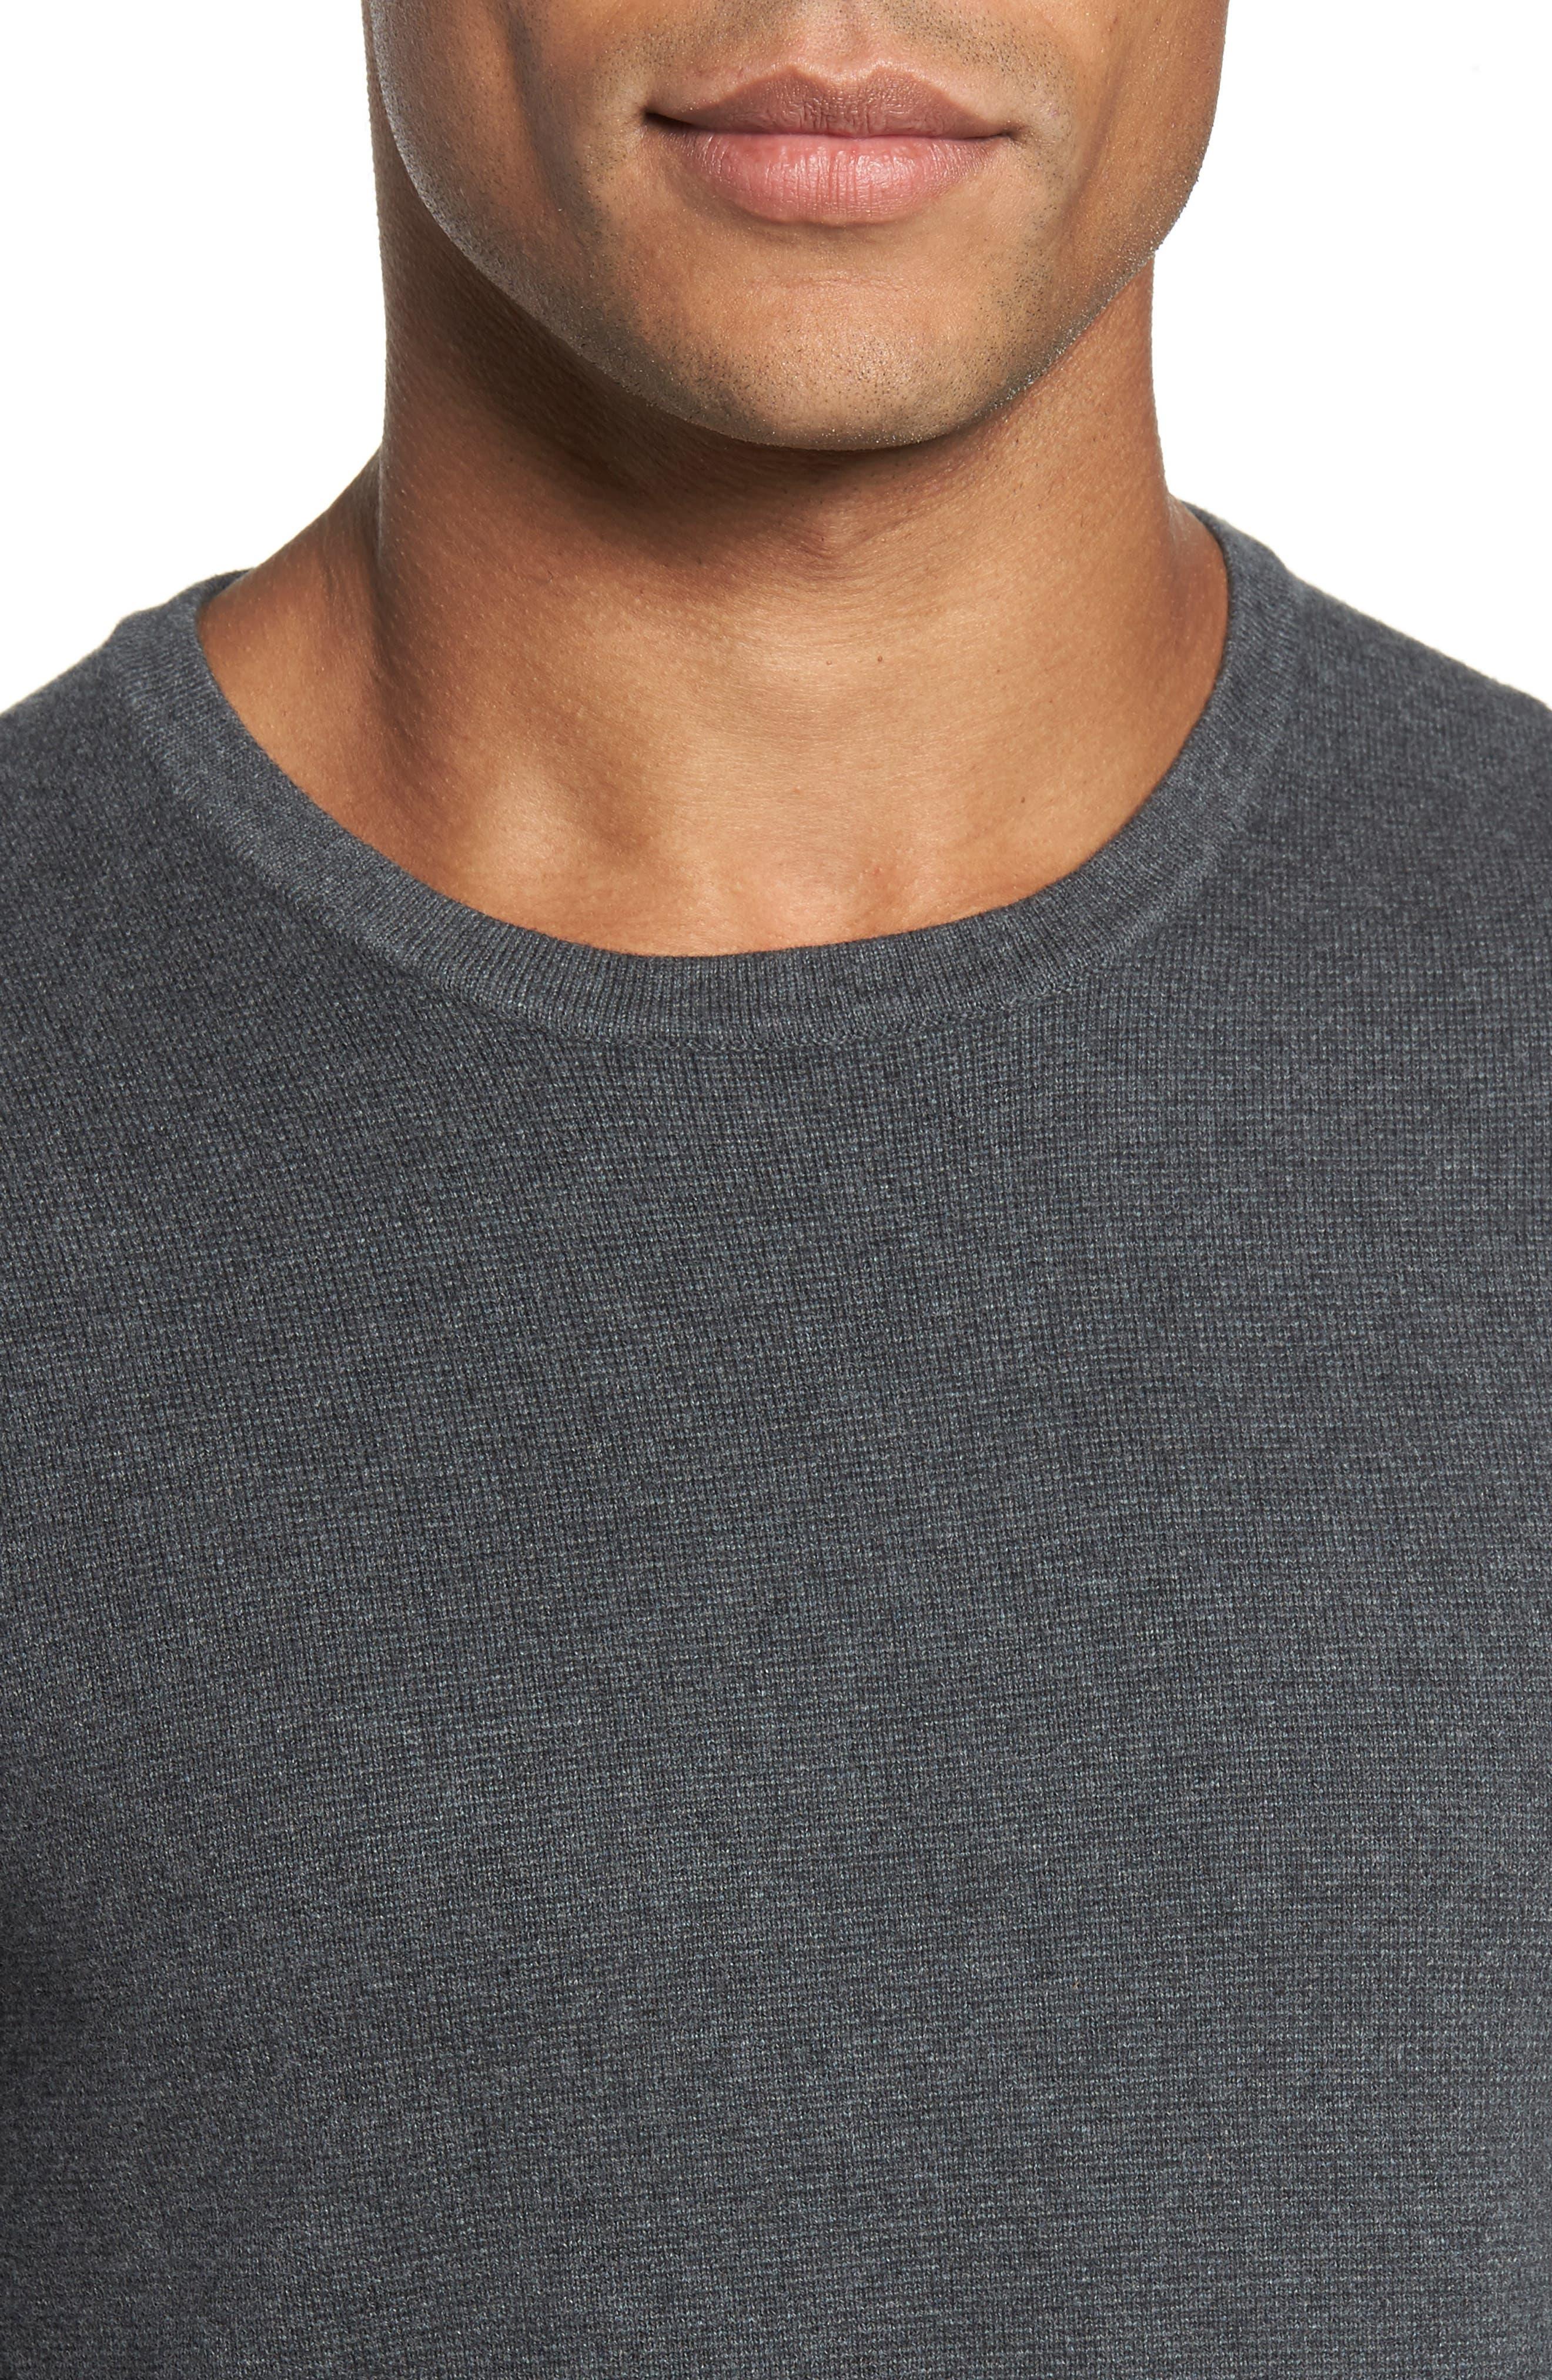 Milano Front Regular Fit Cotton Sweater,                             Alternate thumbnail 4, color,                             CHARCOAL MELANGE